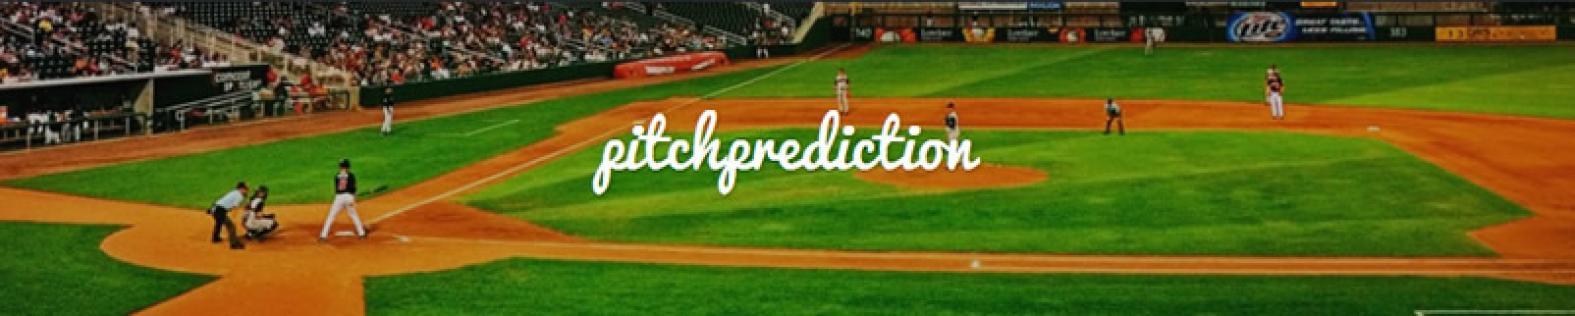 pitchprediction.jpg